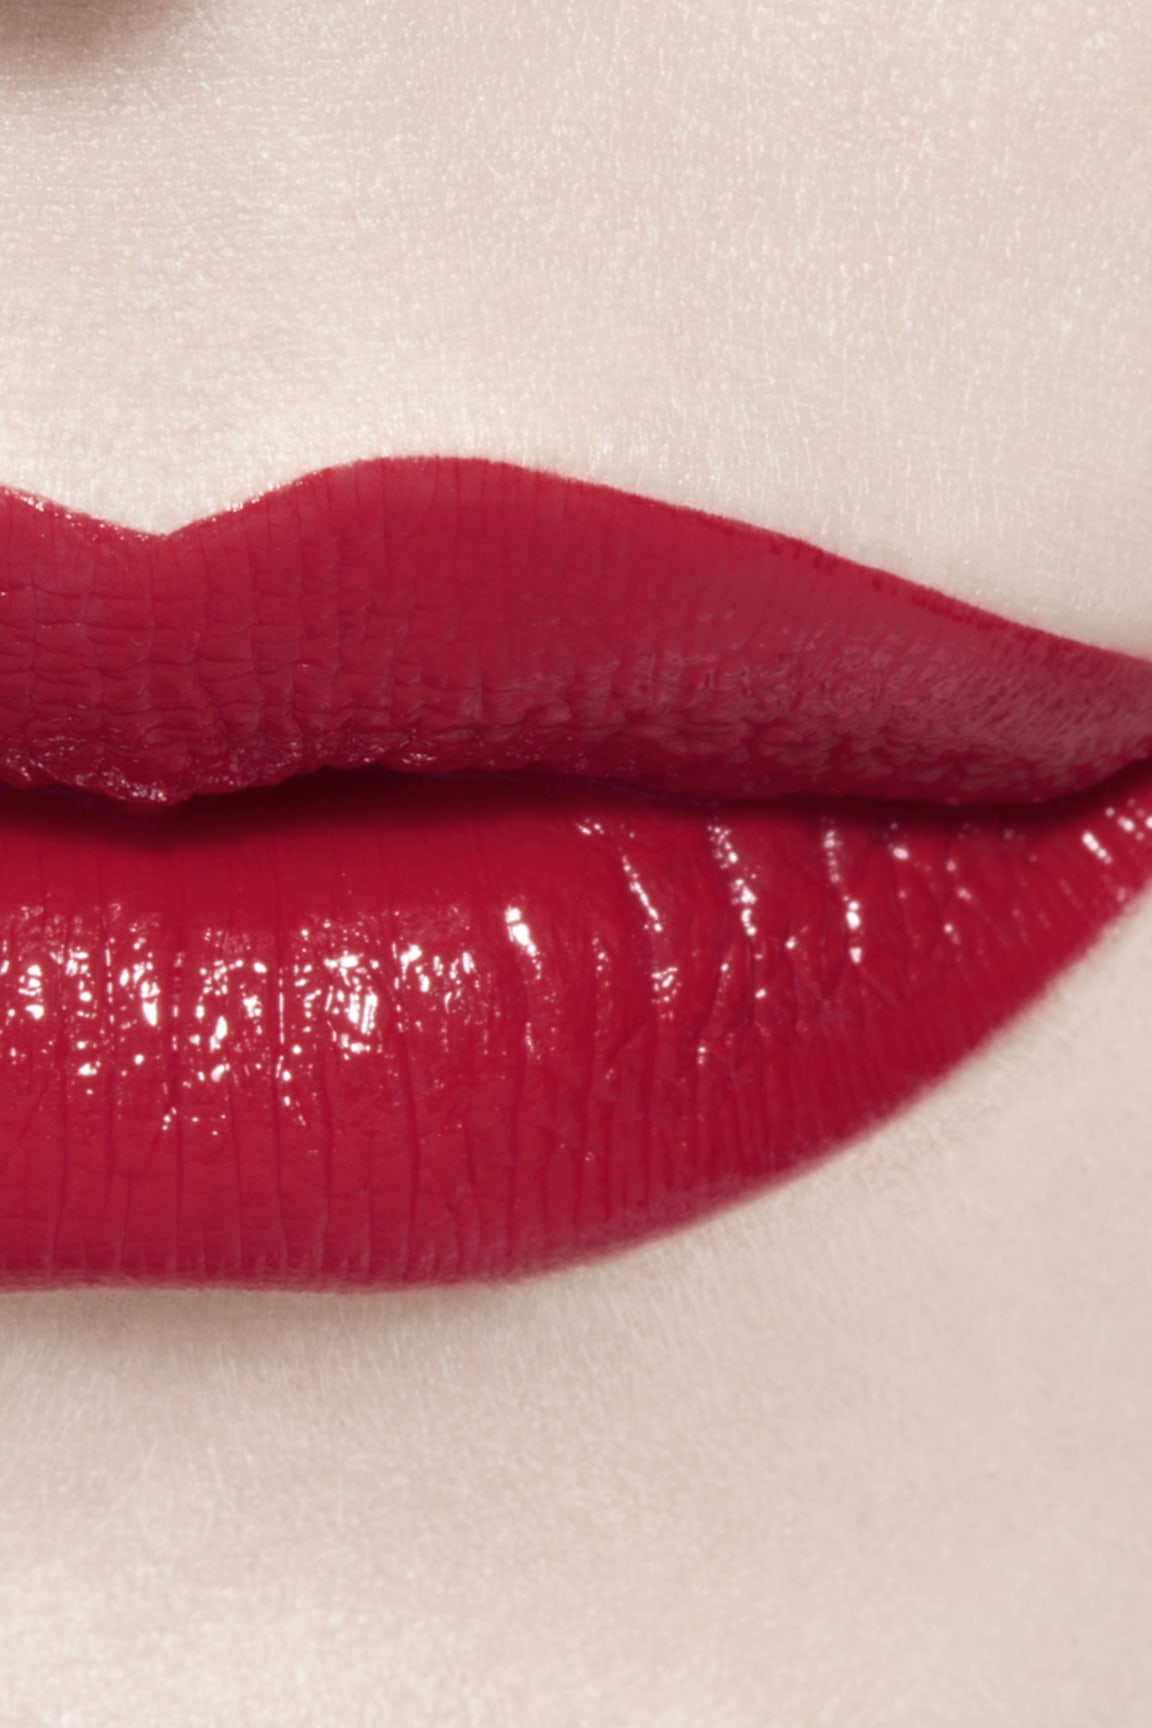 Anwendung Make-up-Bild 3 - ROUGE COCO BLOOM 138 - VITALITÉ